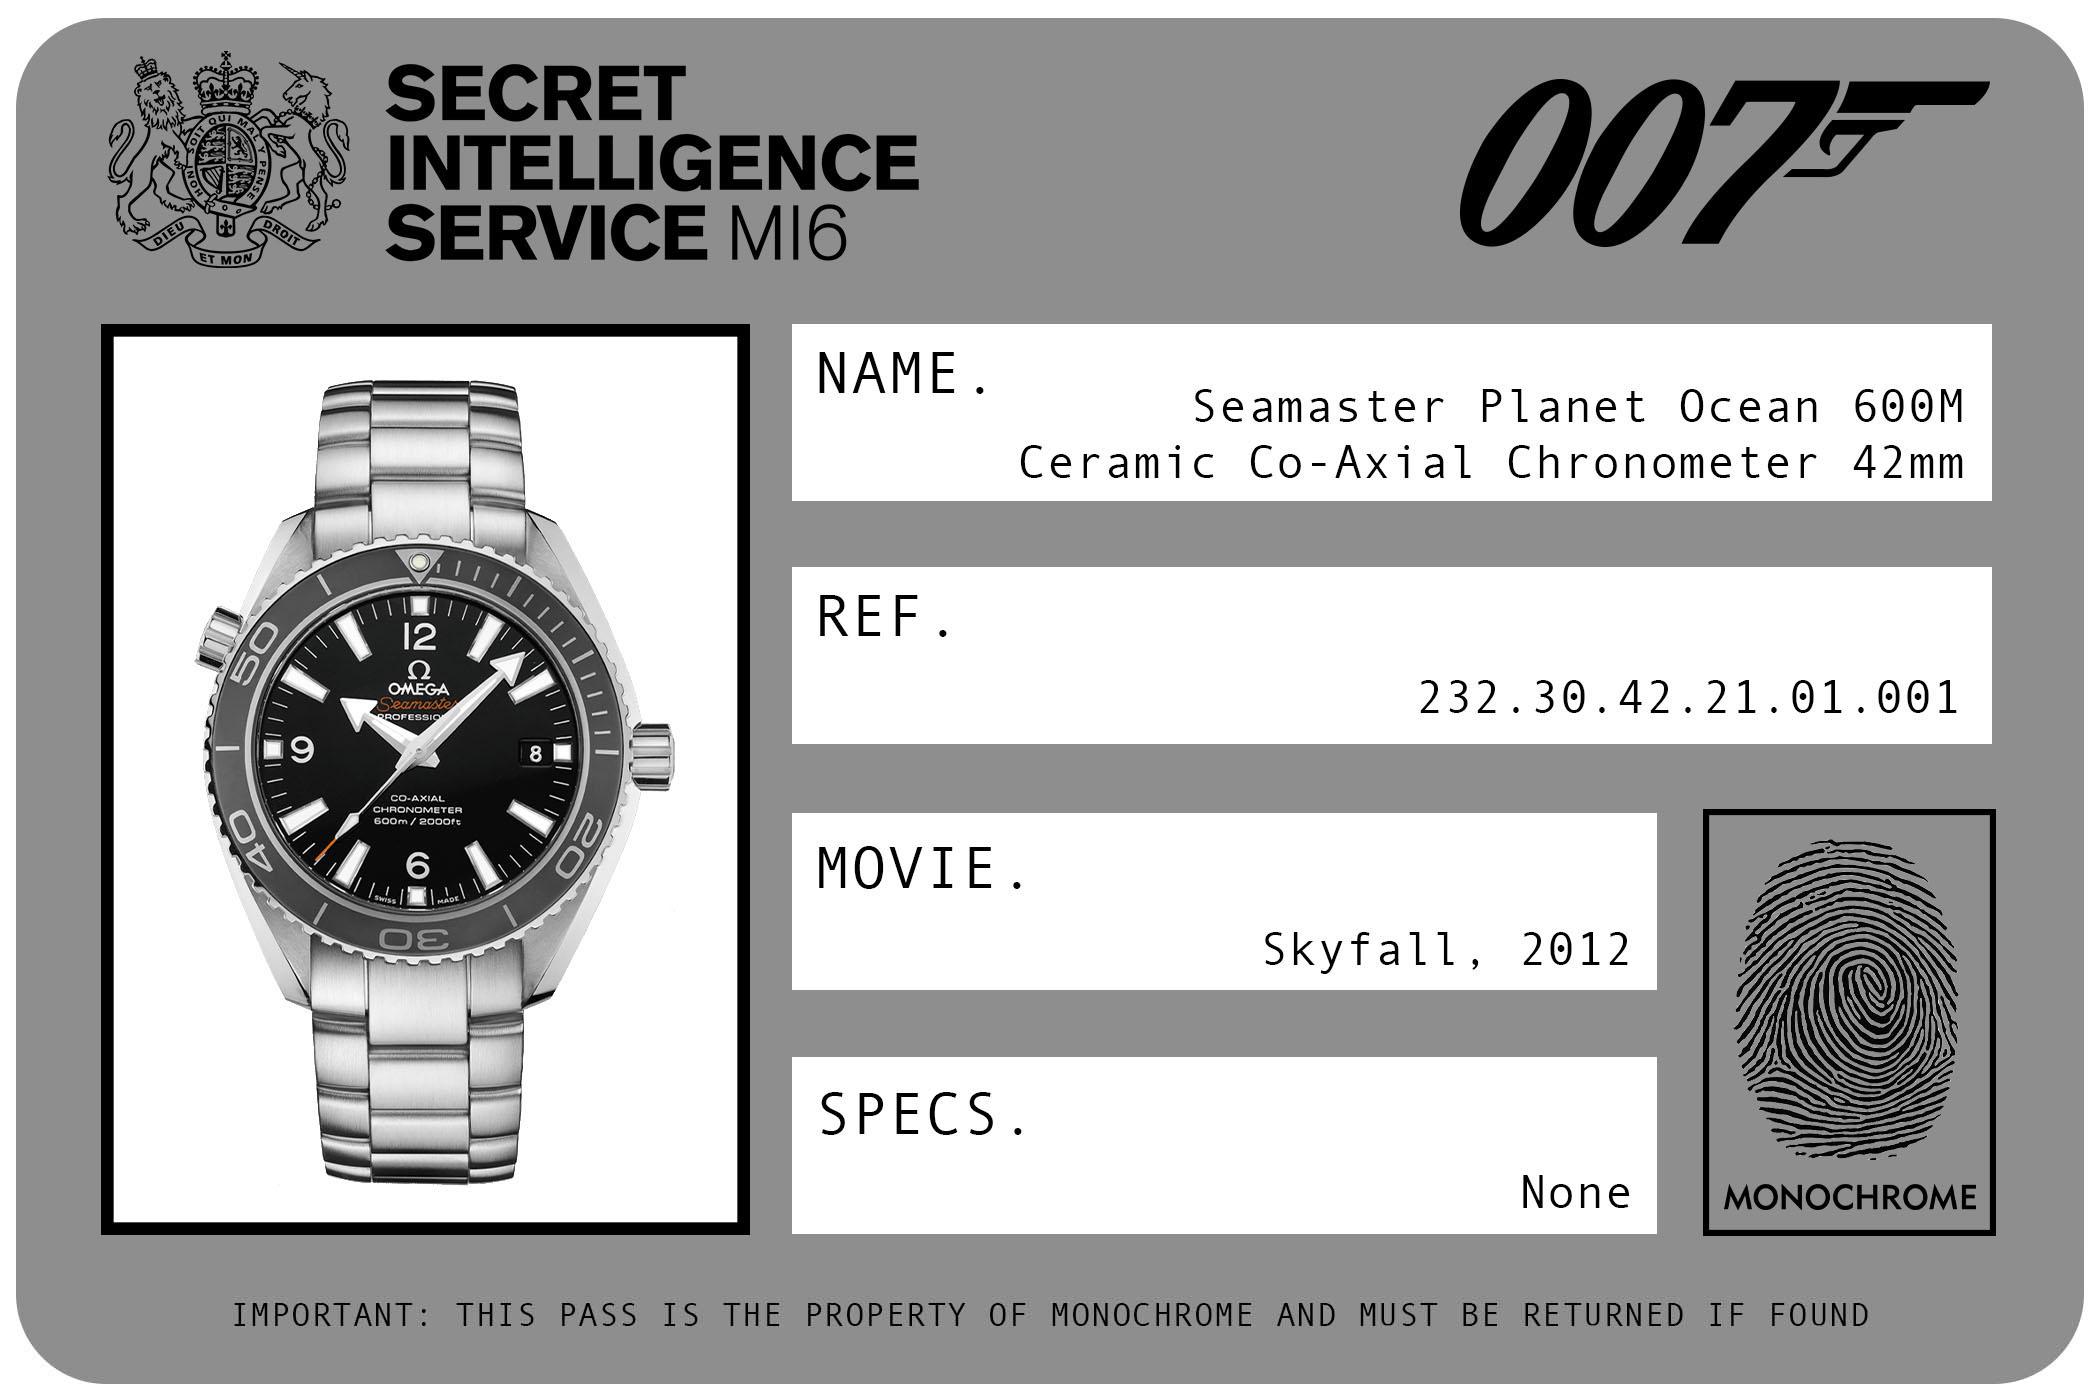 Omega Seamaster Planet Ocean 600M Ceramic Co-Axial Chronometer 42mm 232.30.42.21.01.001 James Bond Skyfall ID Card 2012